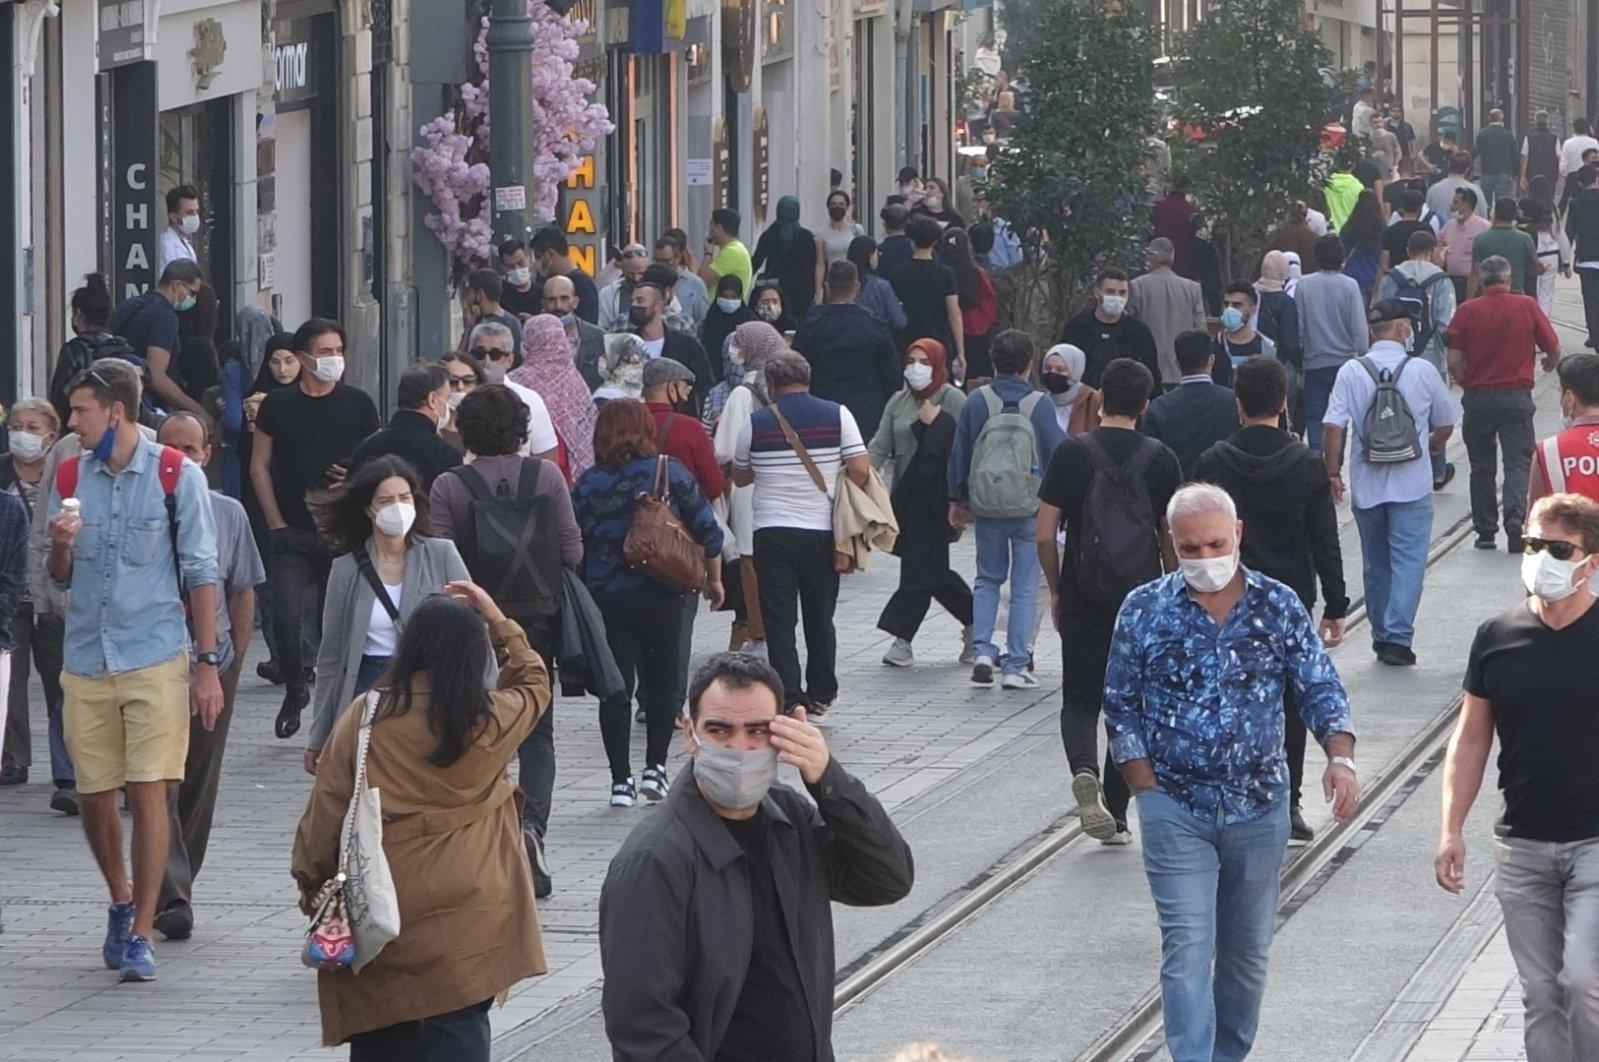 People walk on Istiklal Street in Istanbul, Turkey, Nov. 17, 2020. (DHA Photo)